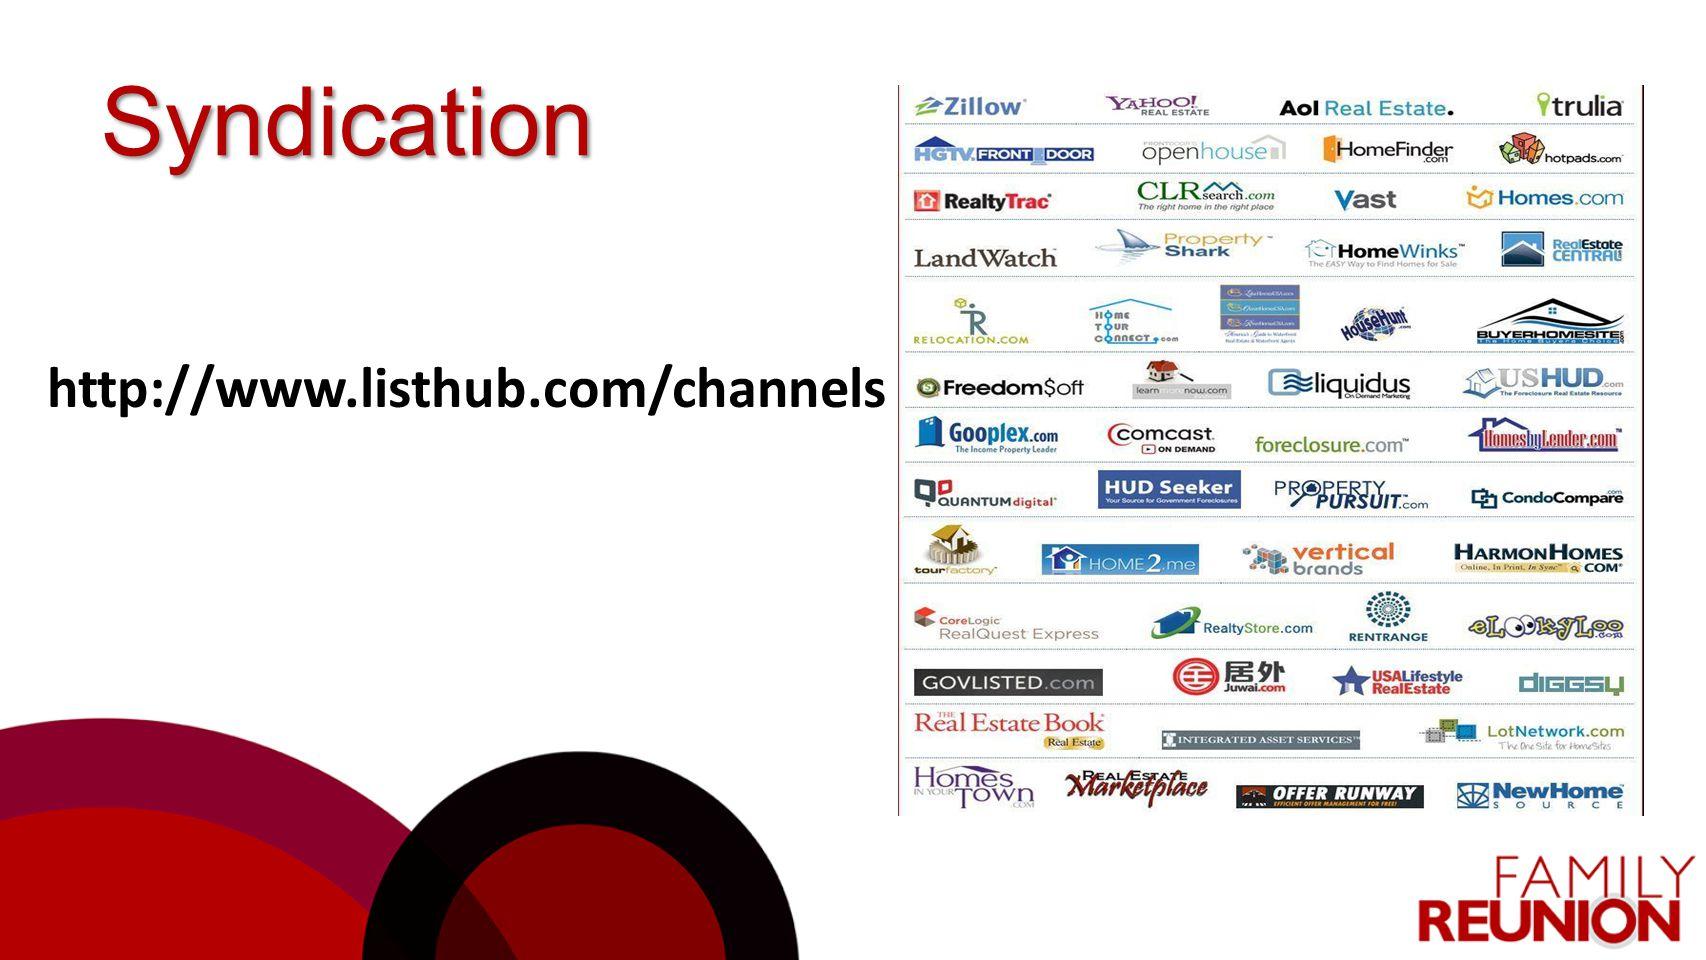 Syndication http://www.listhub.com/channels